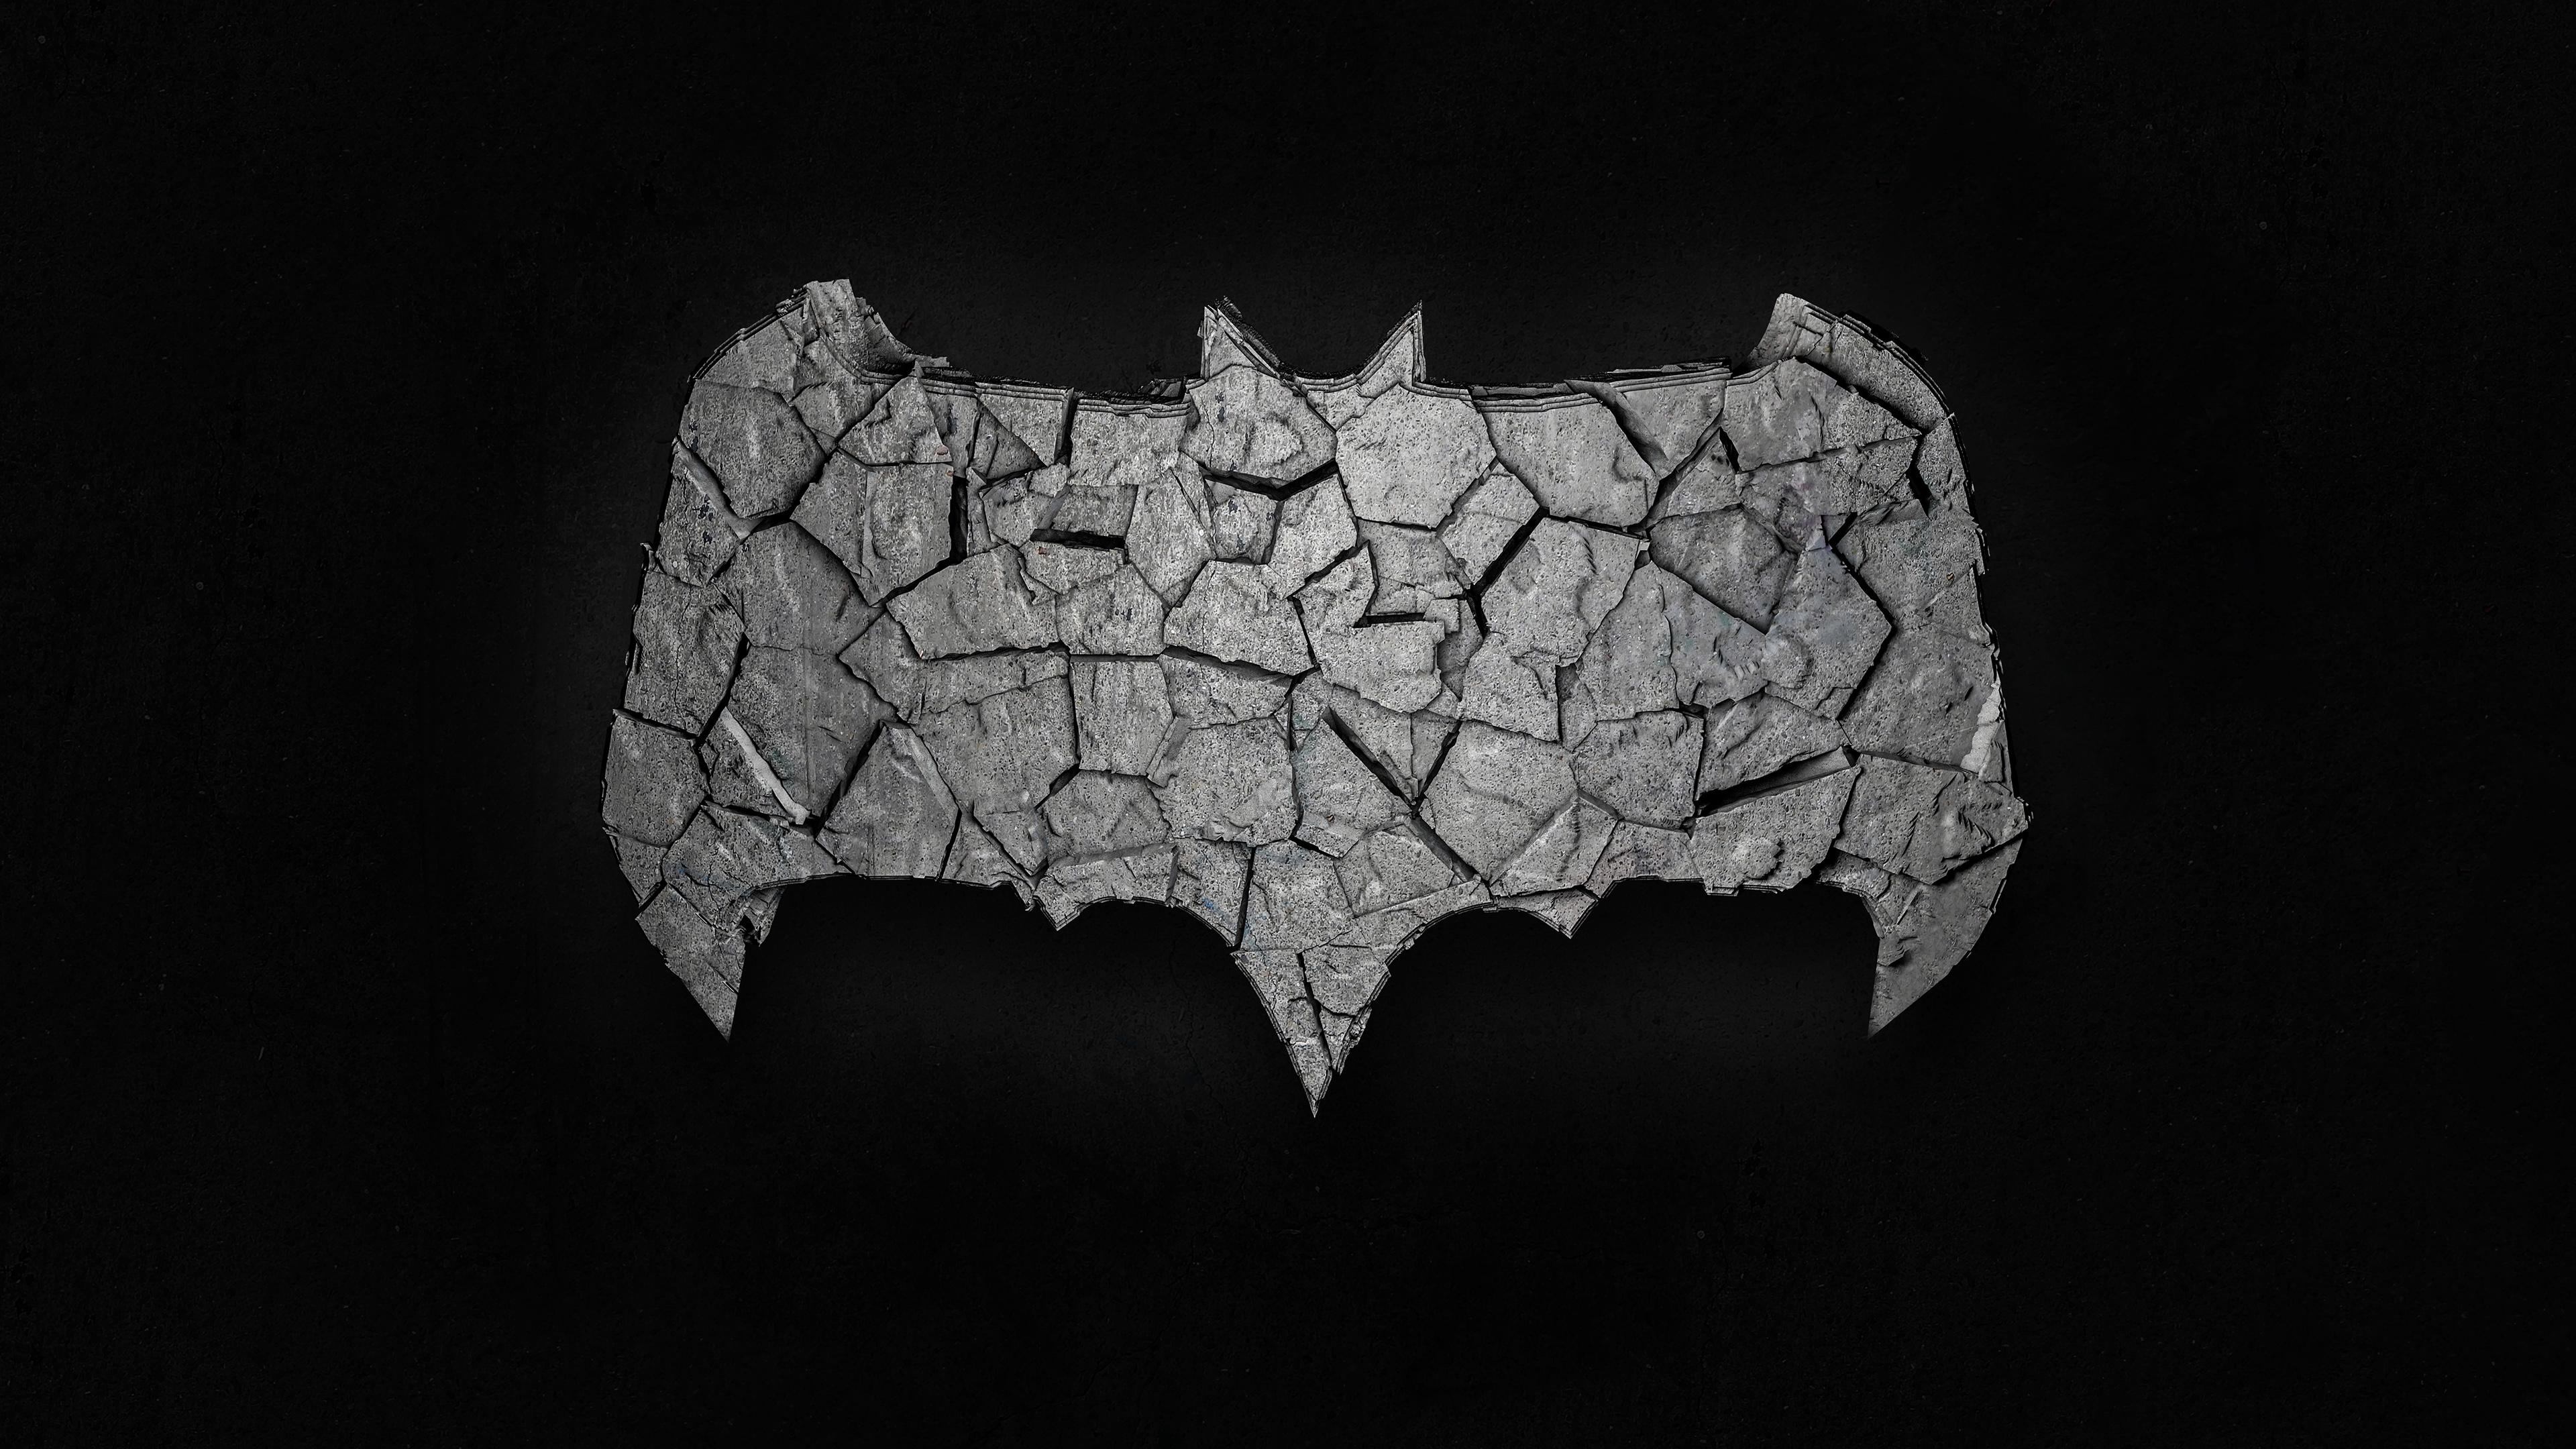 batman logo 3d art 1565052903 - Batman Logo 3d Art - superheroes wallpapers, logo wallpapers, hd-wallpapers, digital art wallpapers, behance wallpapers, batman wallpapers, artwork wallpapers, artist wallpapers, 4k-wallpapers